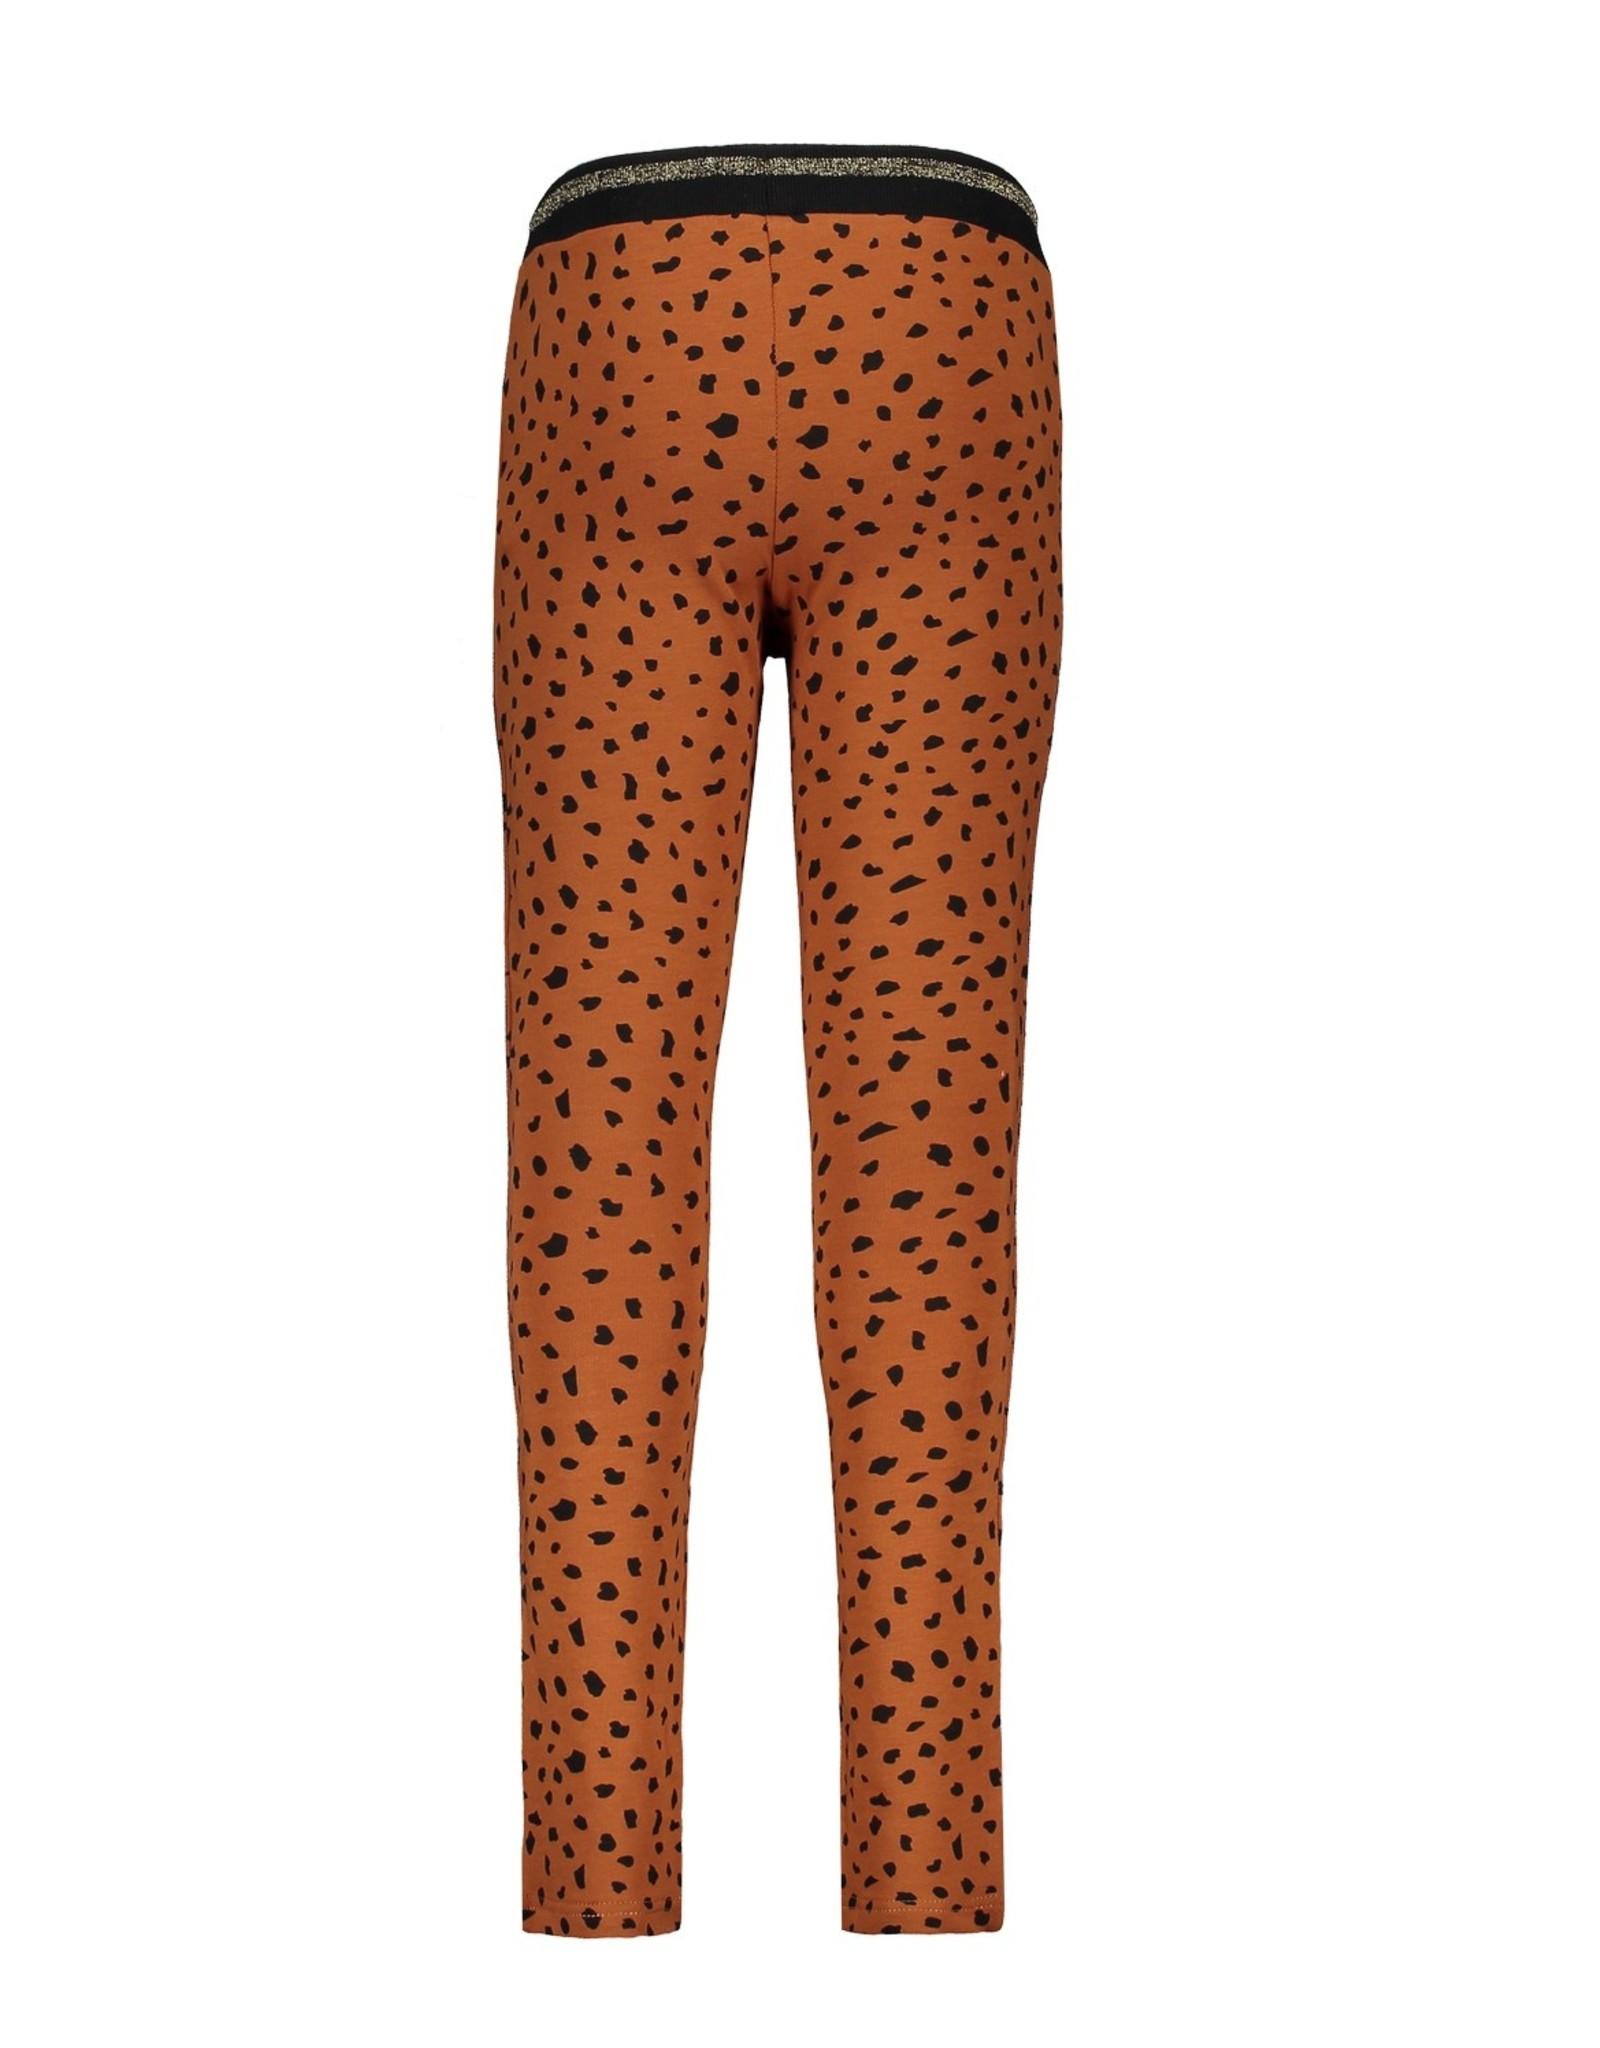 Bampidano Bampidano Junior Girls sweat trousers Caprice check/allover print with striped tape + rib waist MON CHERI, mocha aop